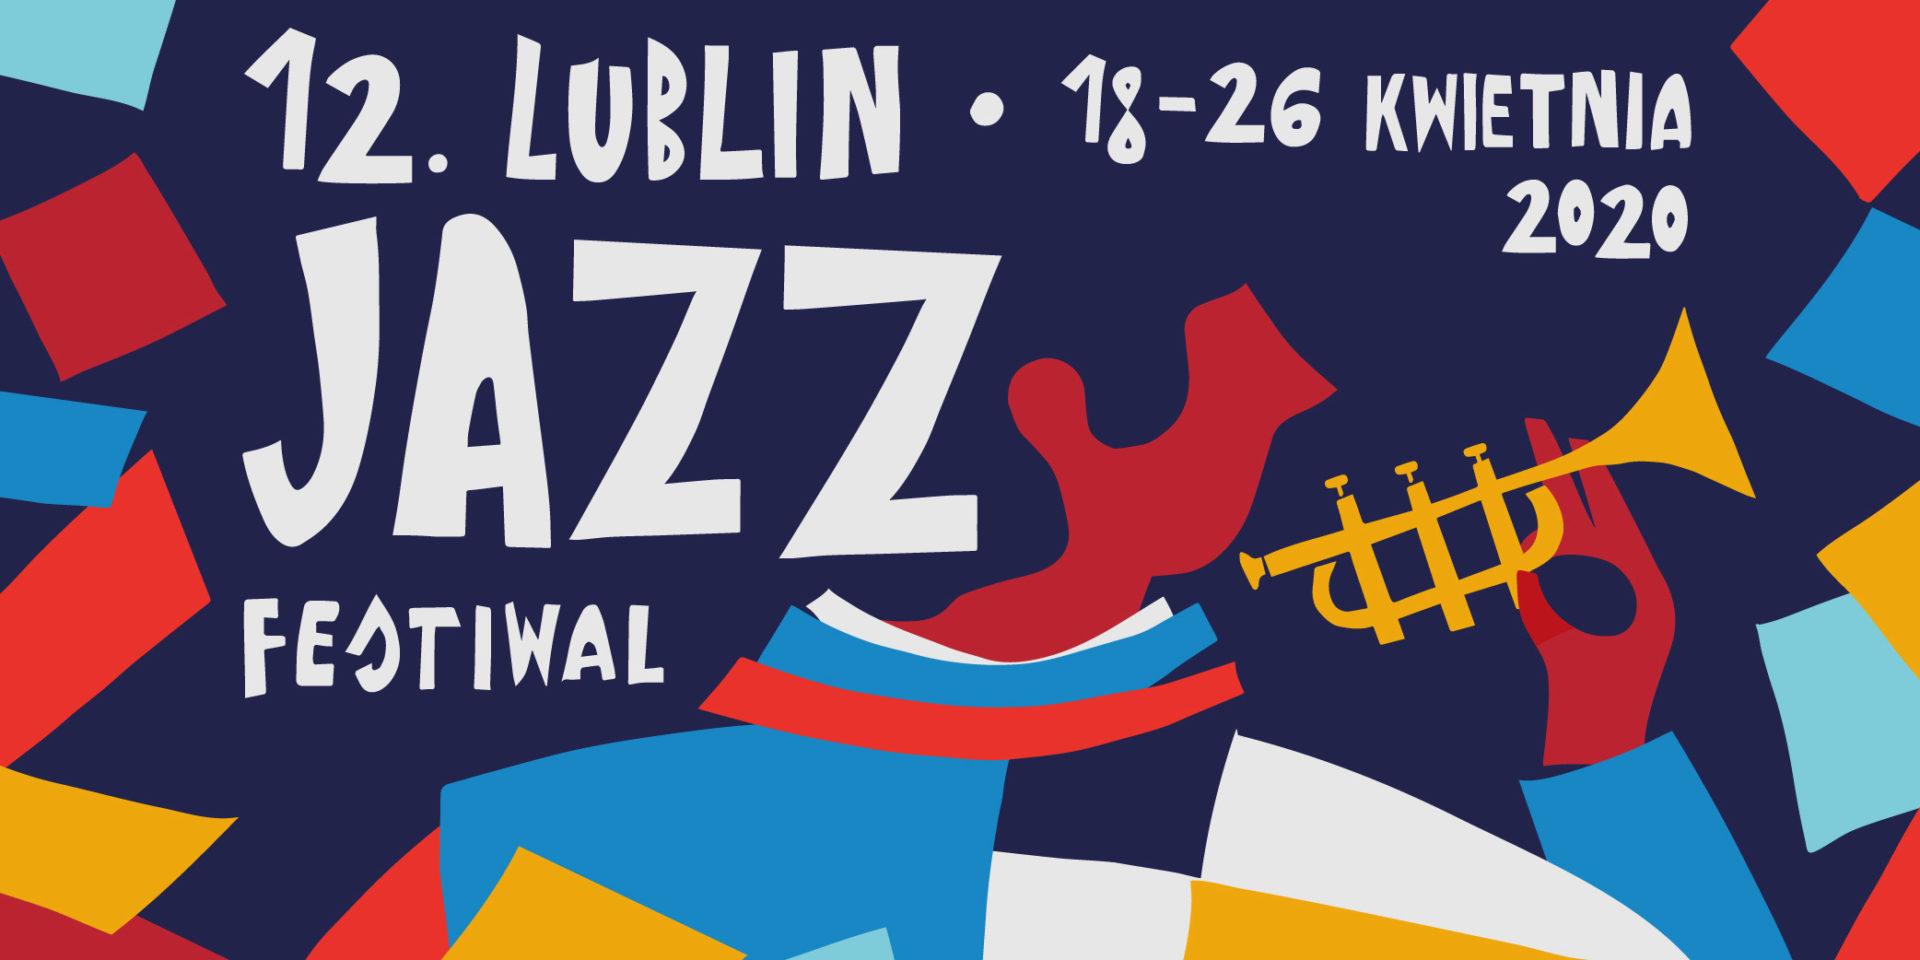 12. Lublin Jazz Festiwal